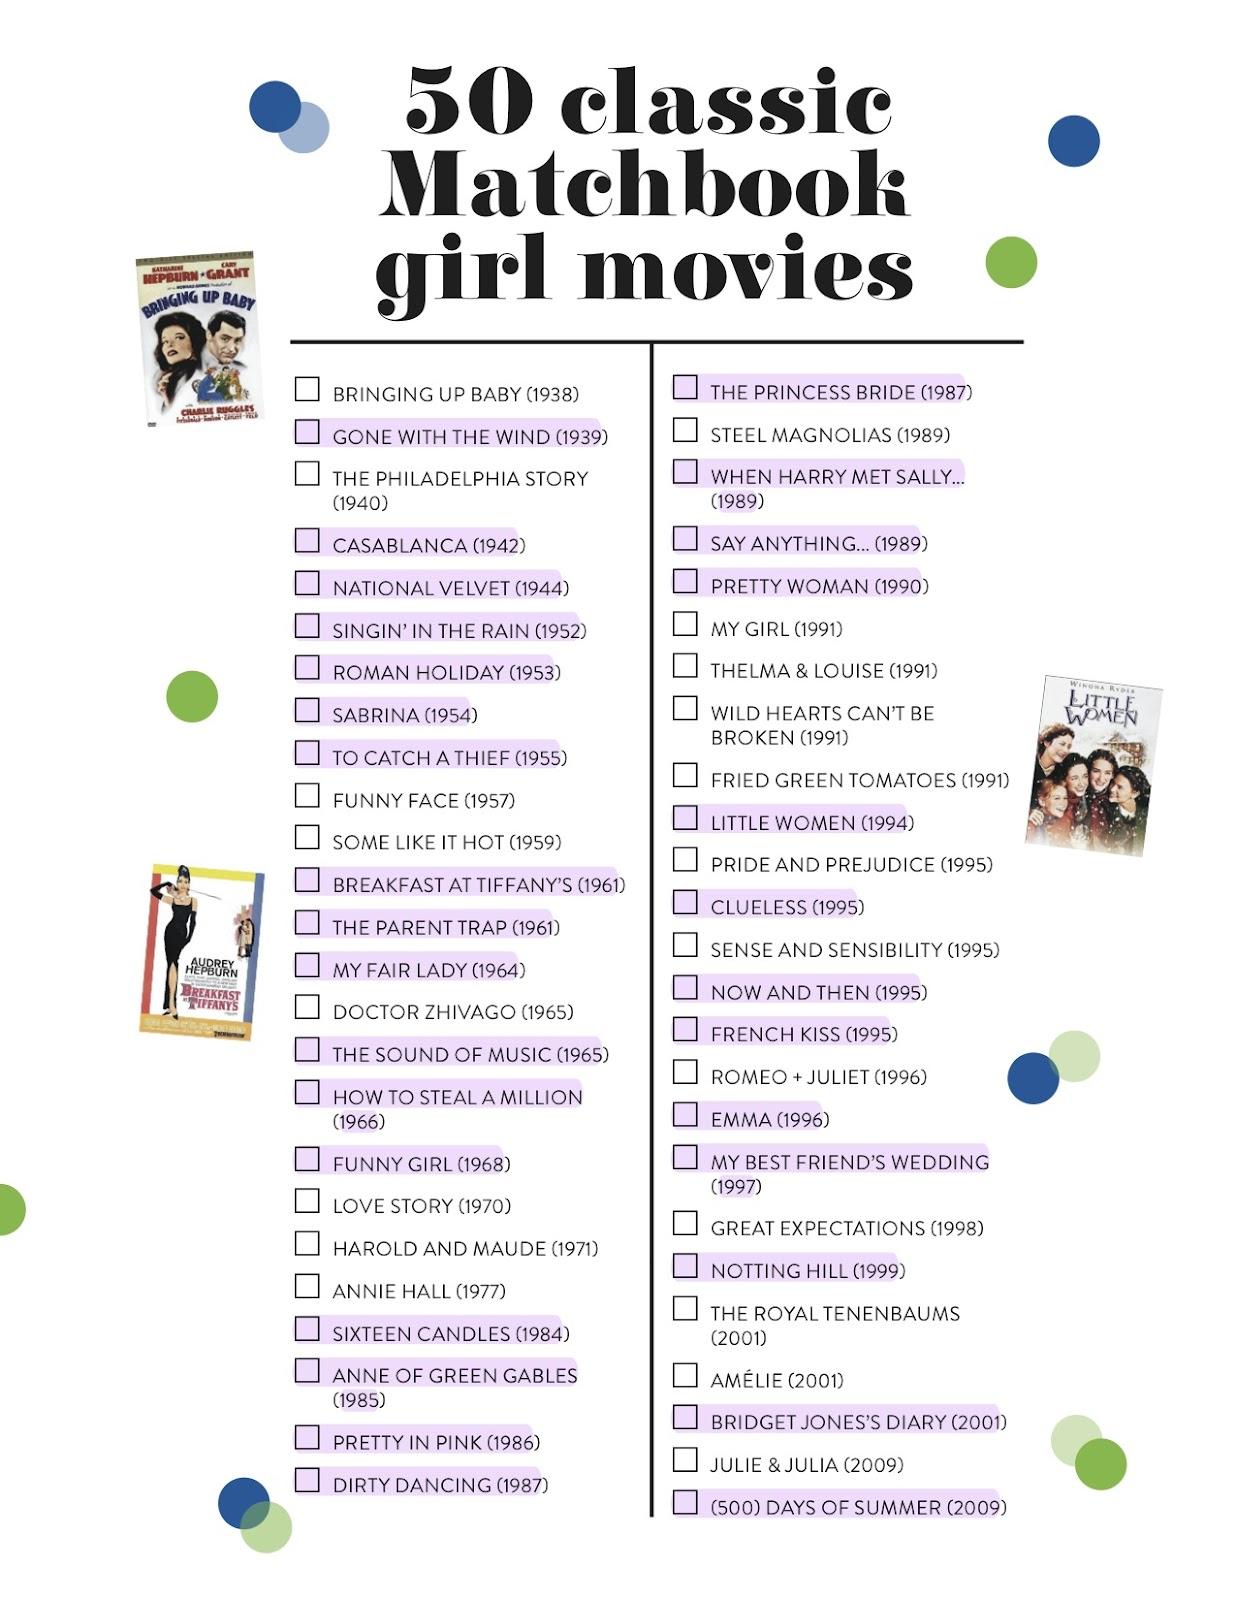 http://2.bp.blogspot.com/-fLqOB7acKnY/UGu35veE_4I/AAAAAAAACIk/jDtQ58DabUQ/s1600/Checklist_films%2Bcopy%2Bcopy%2Bcopy.jpg